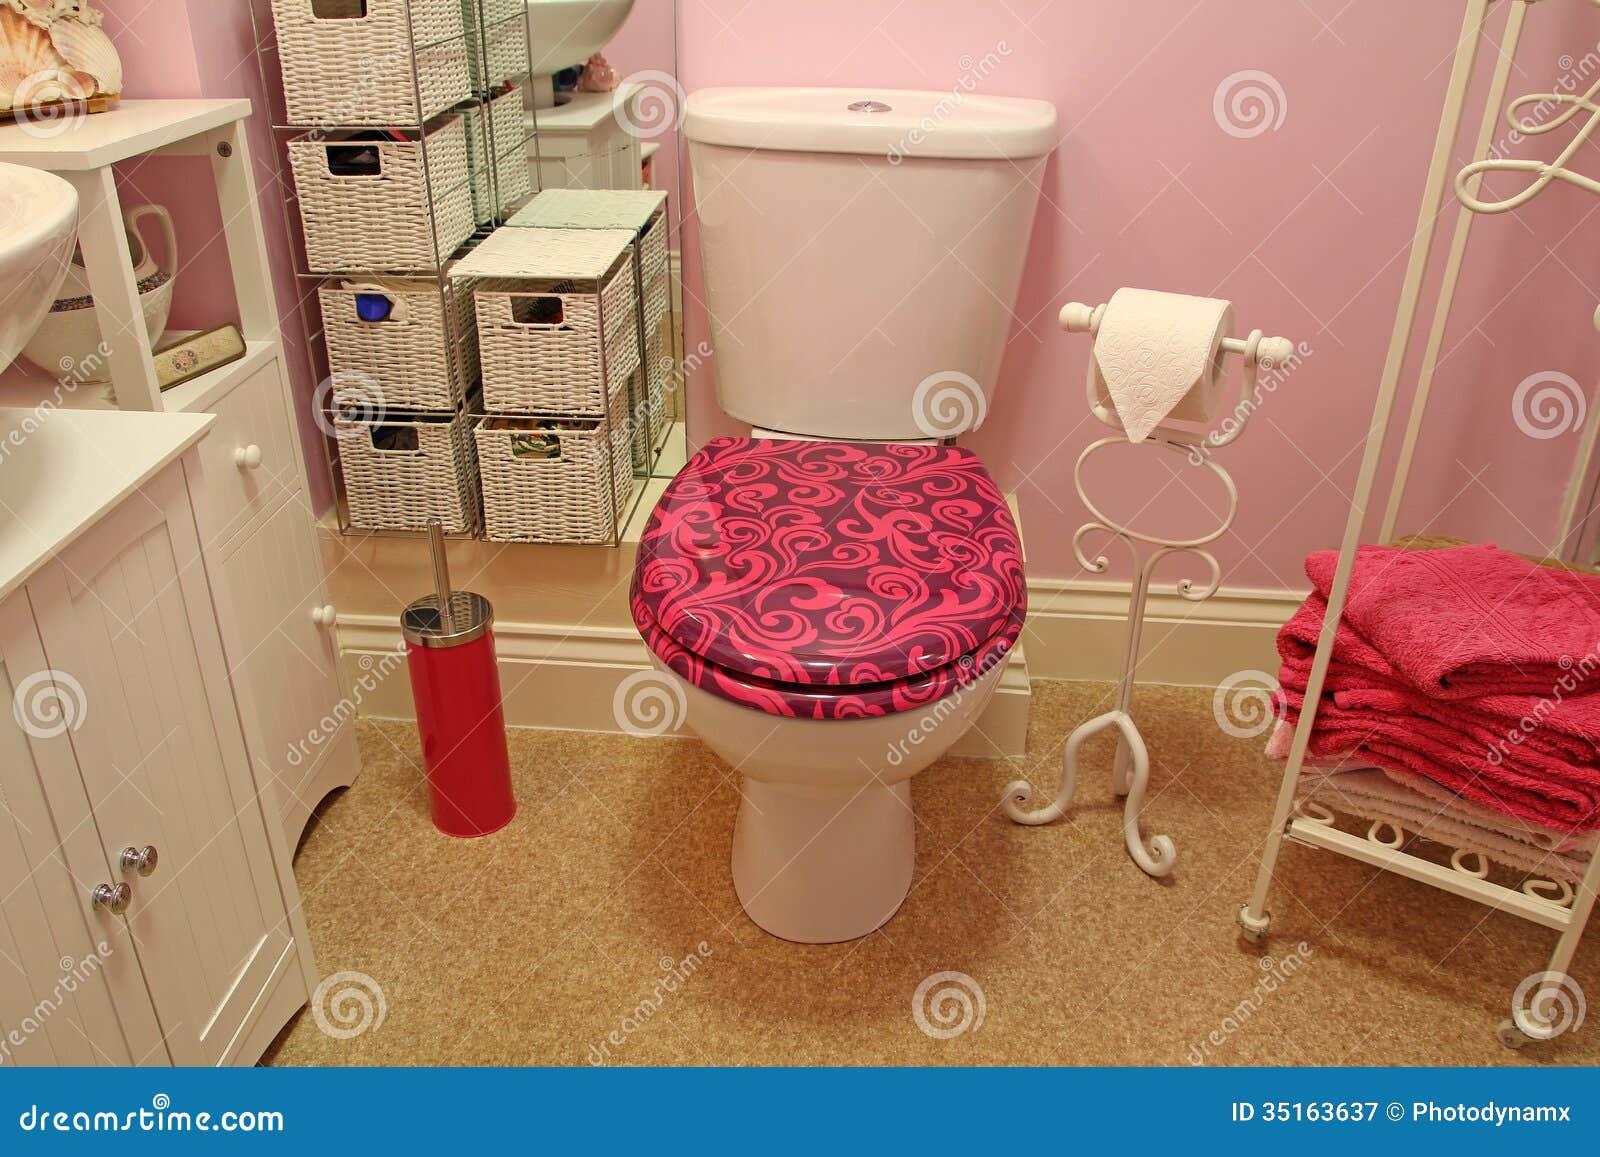 Shabby Chic Bathrooms Shabby chic bathroom